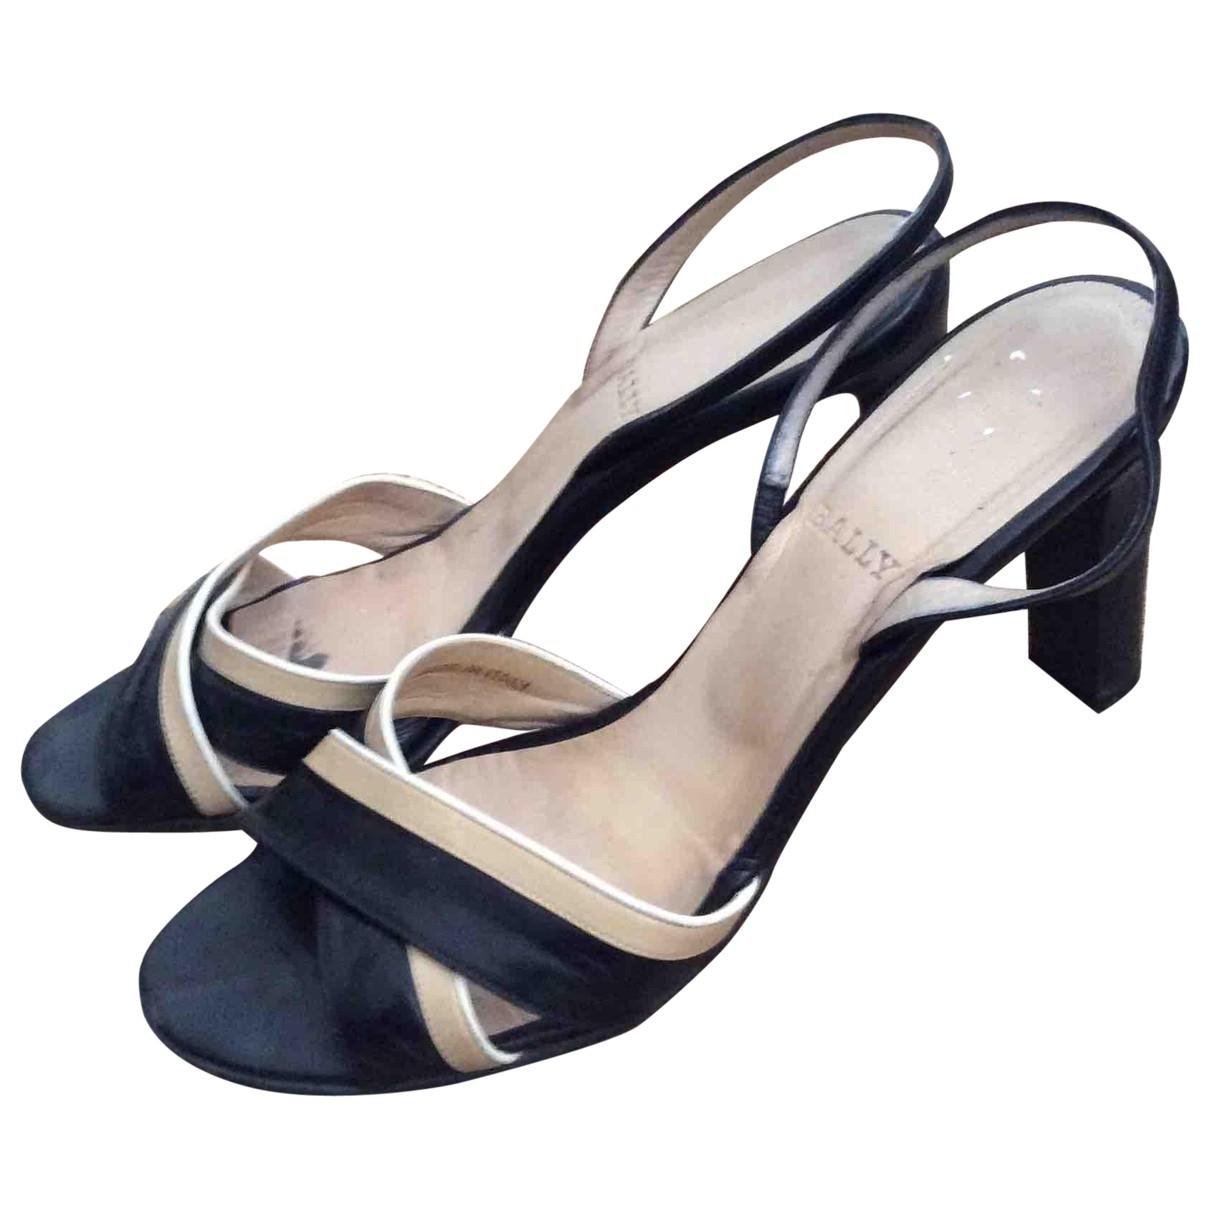 Bally \N Multicolour Leather Sandals for Women 40 EU